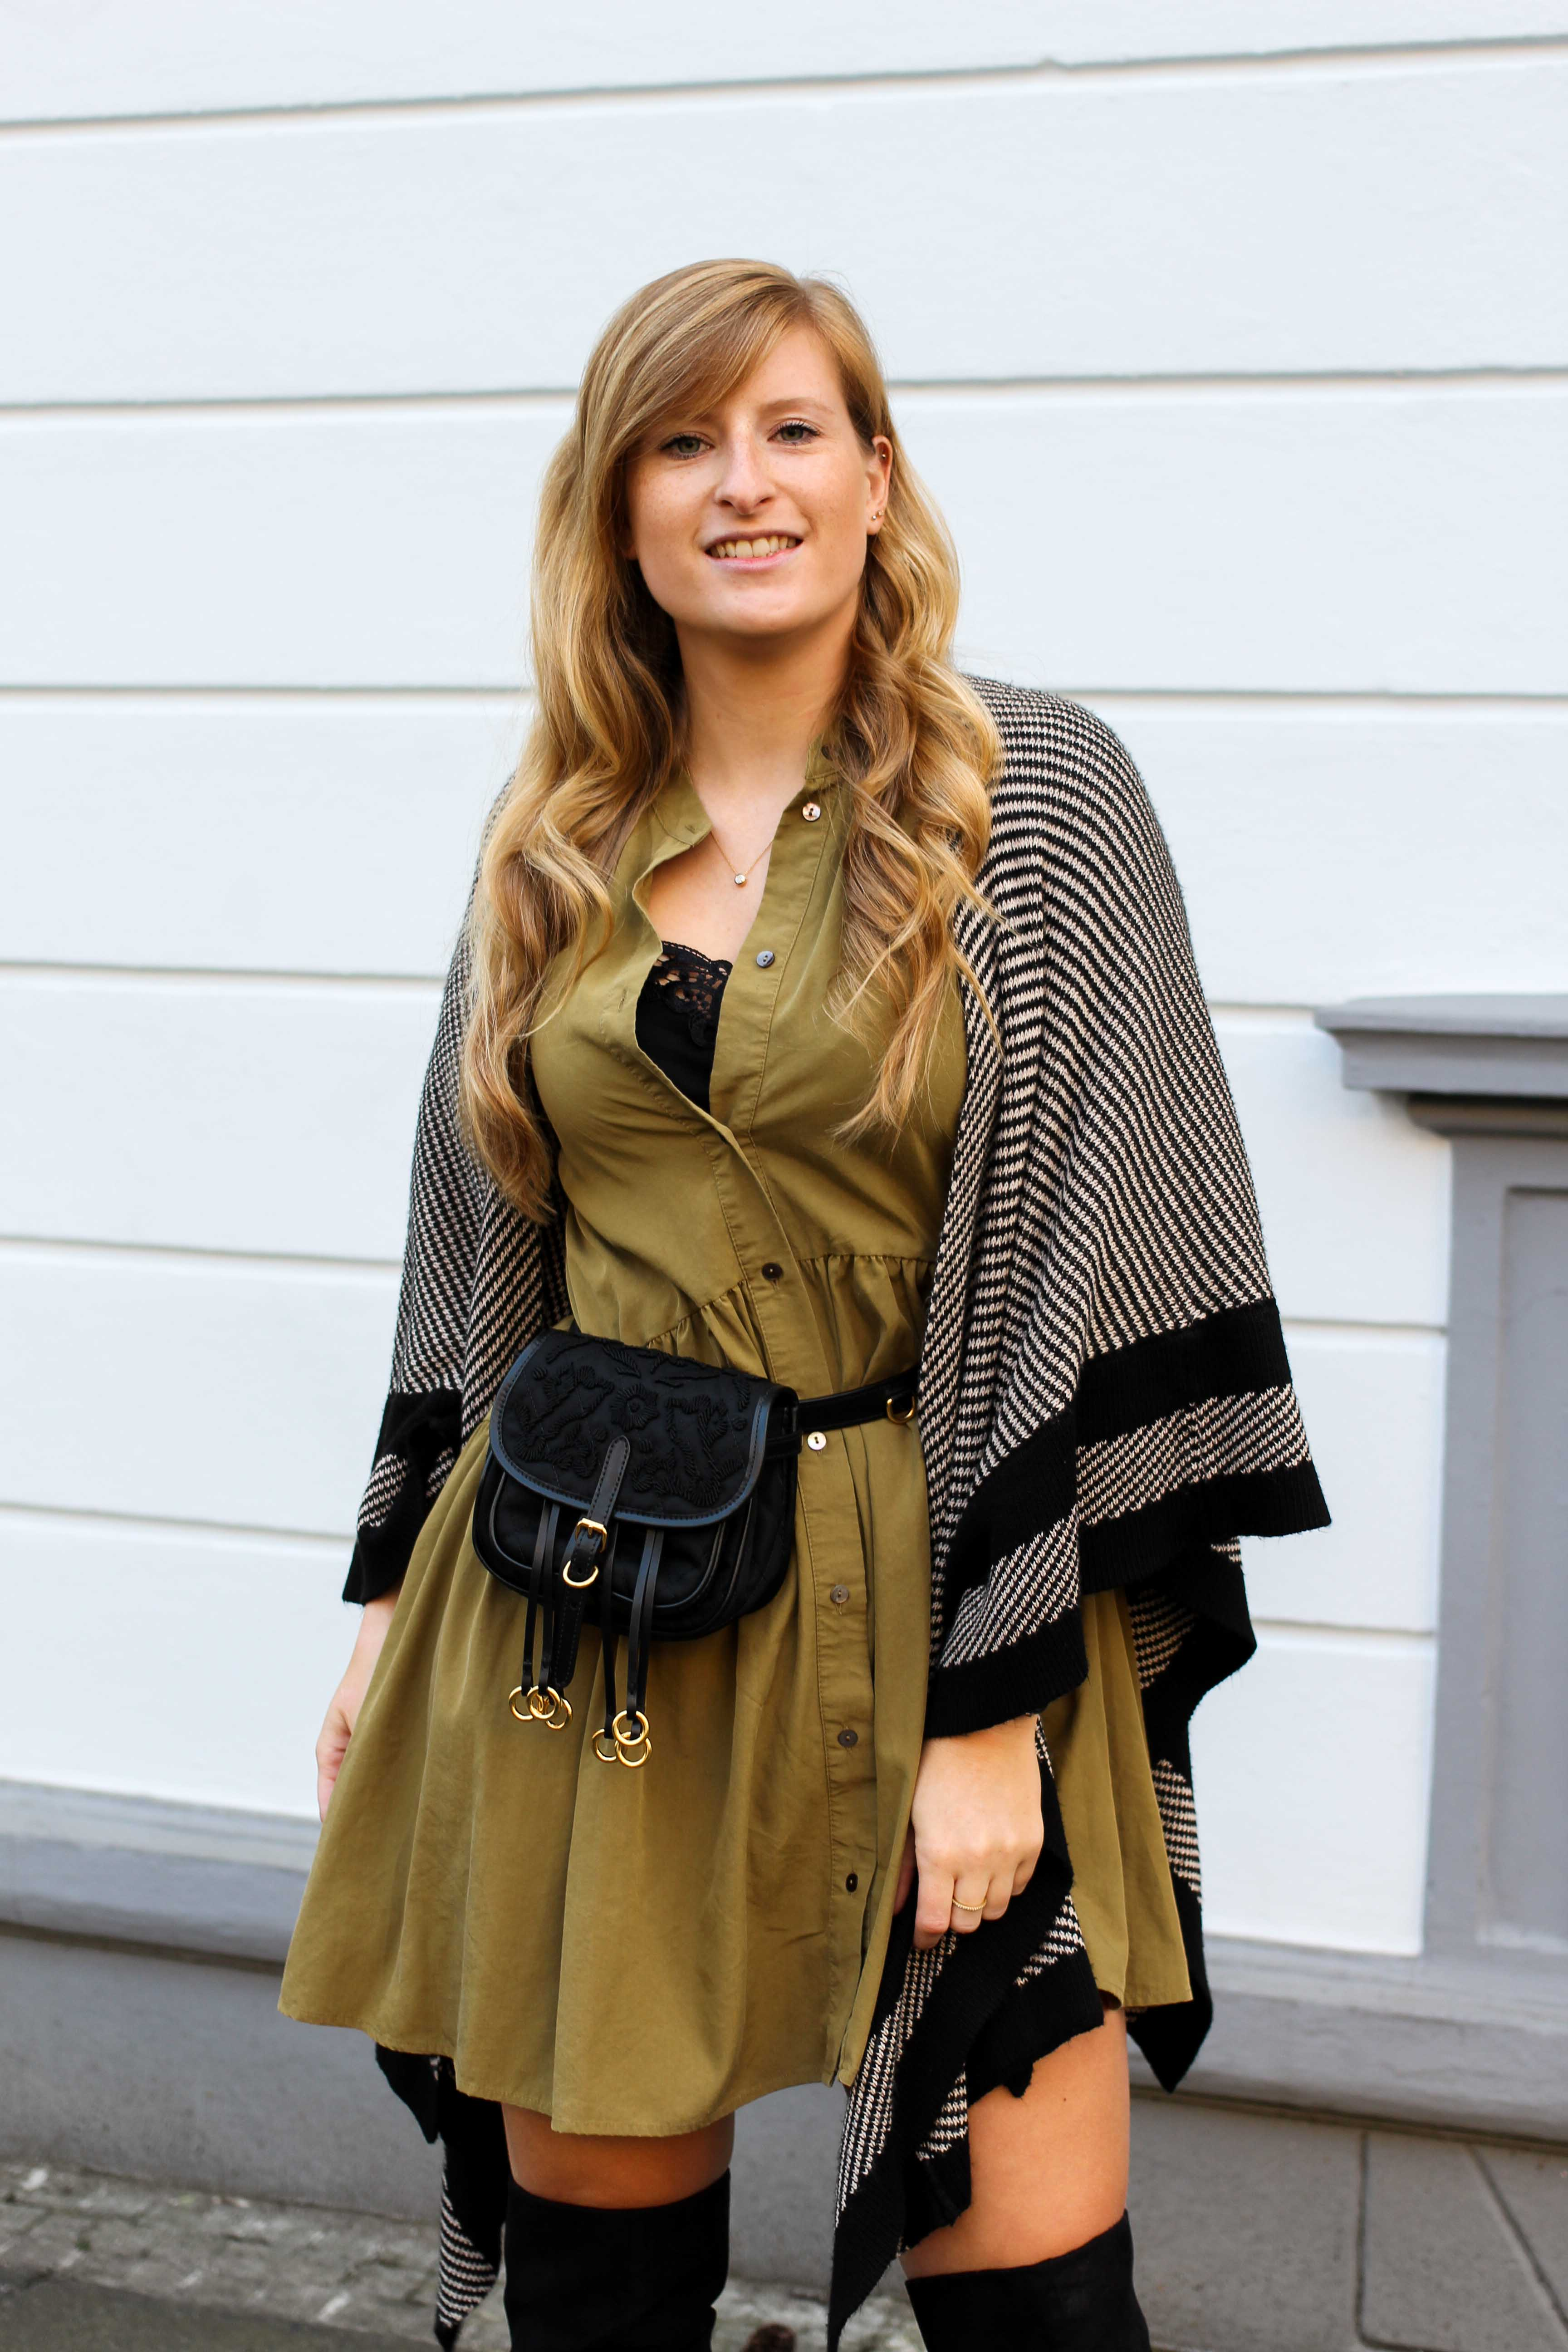 Overknees Gürteltasche Prada Poncho Second-Hand Kleidung kombinieren Streetstyle Outfit Bonn Zara Kleid grün Frühling 2019 2